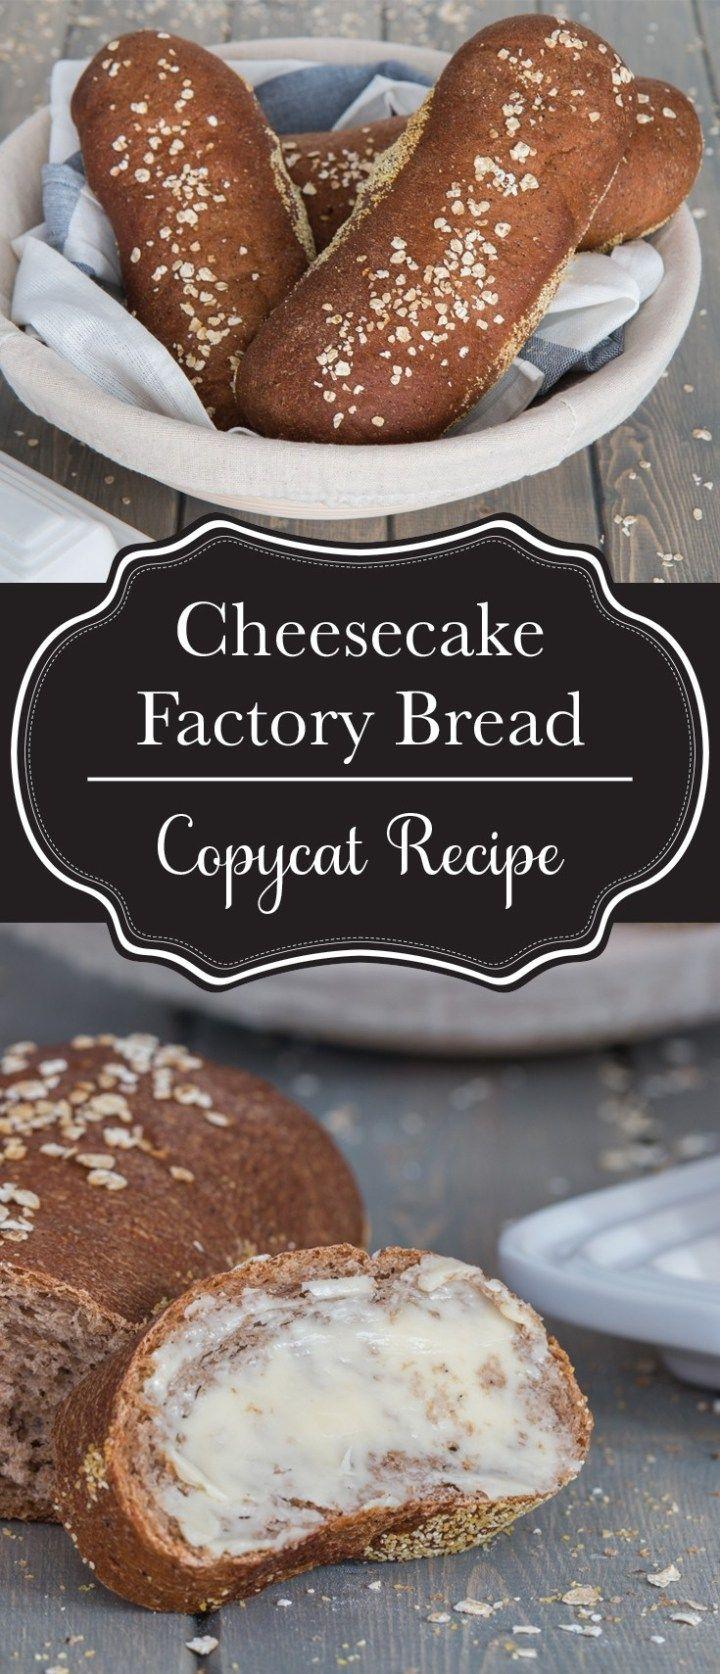 Cheesecake Factory brown bread copycat recipe. This honey